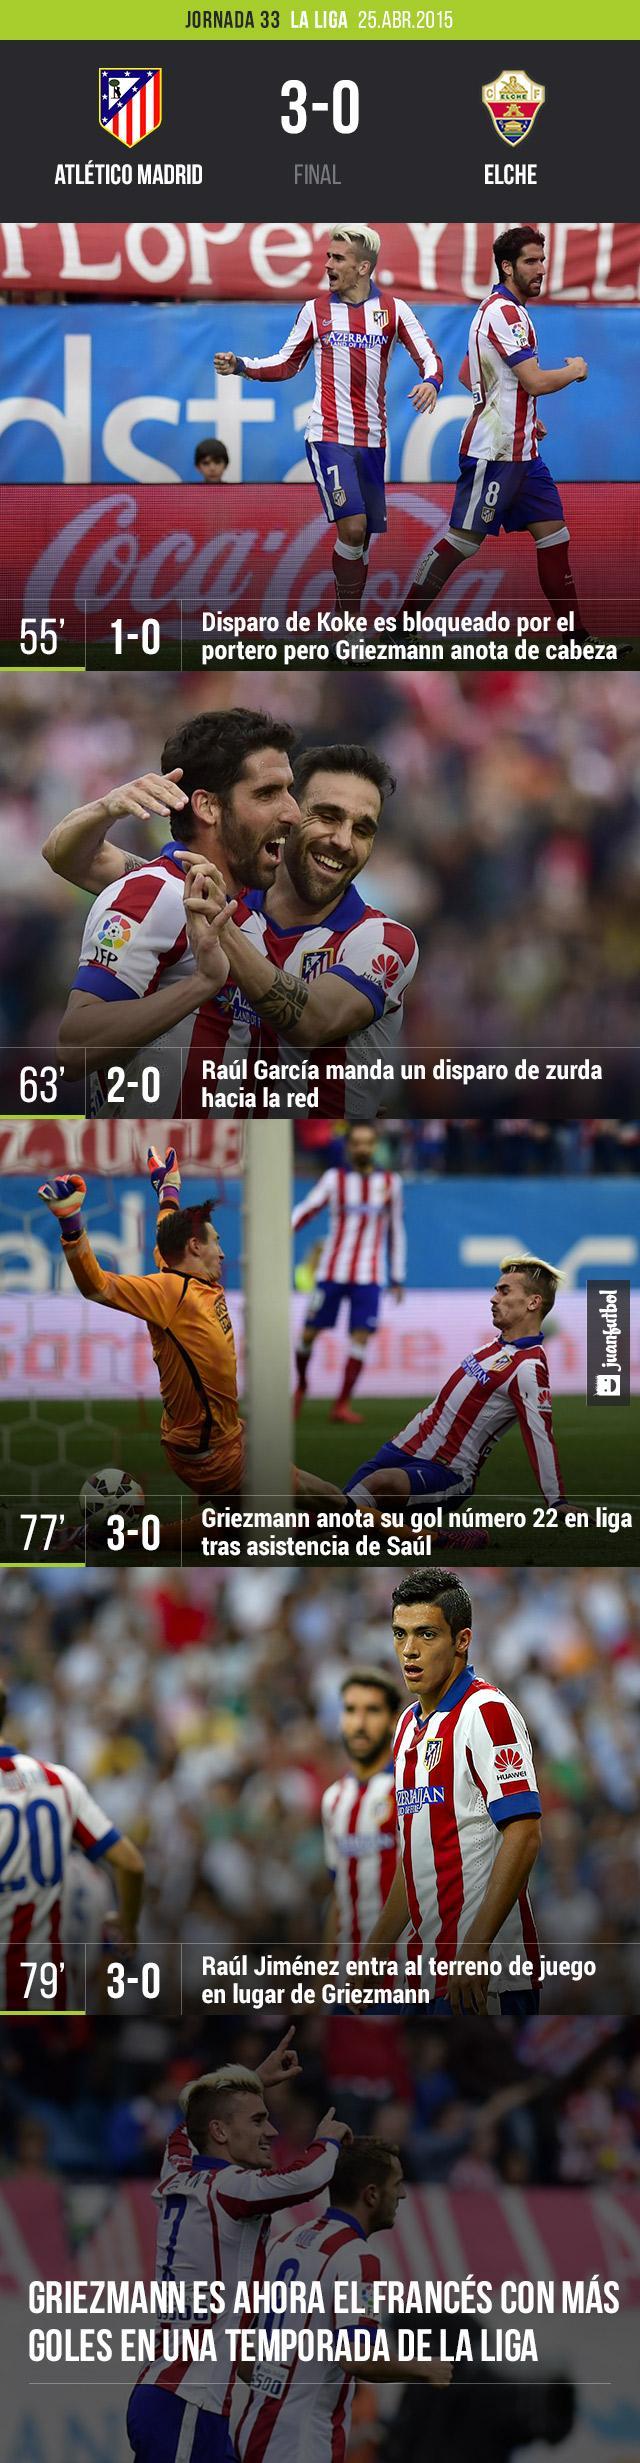 Atlético Madrid vs Elche